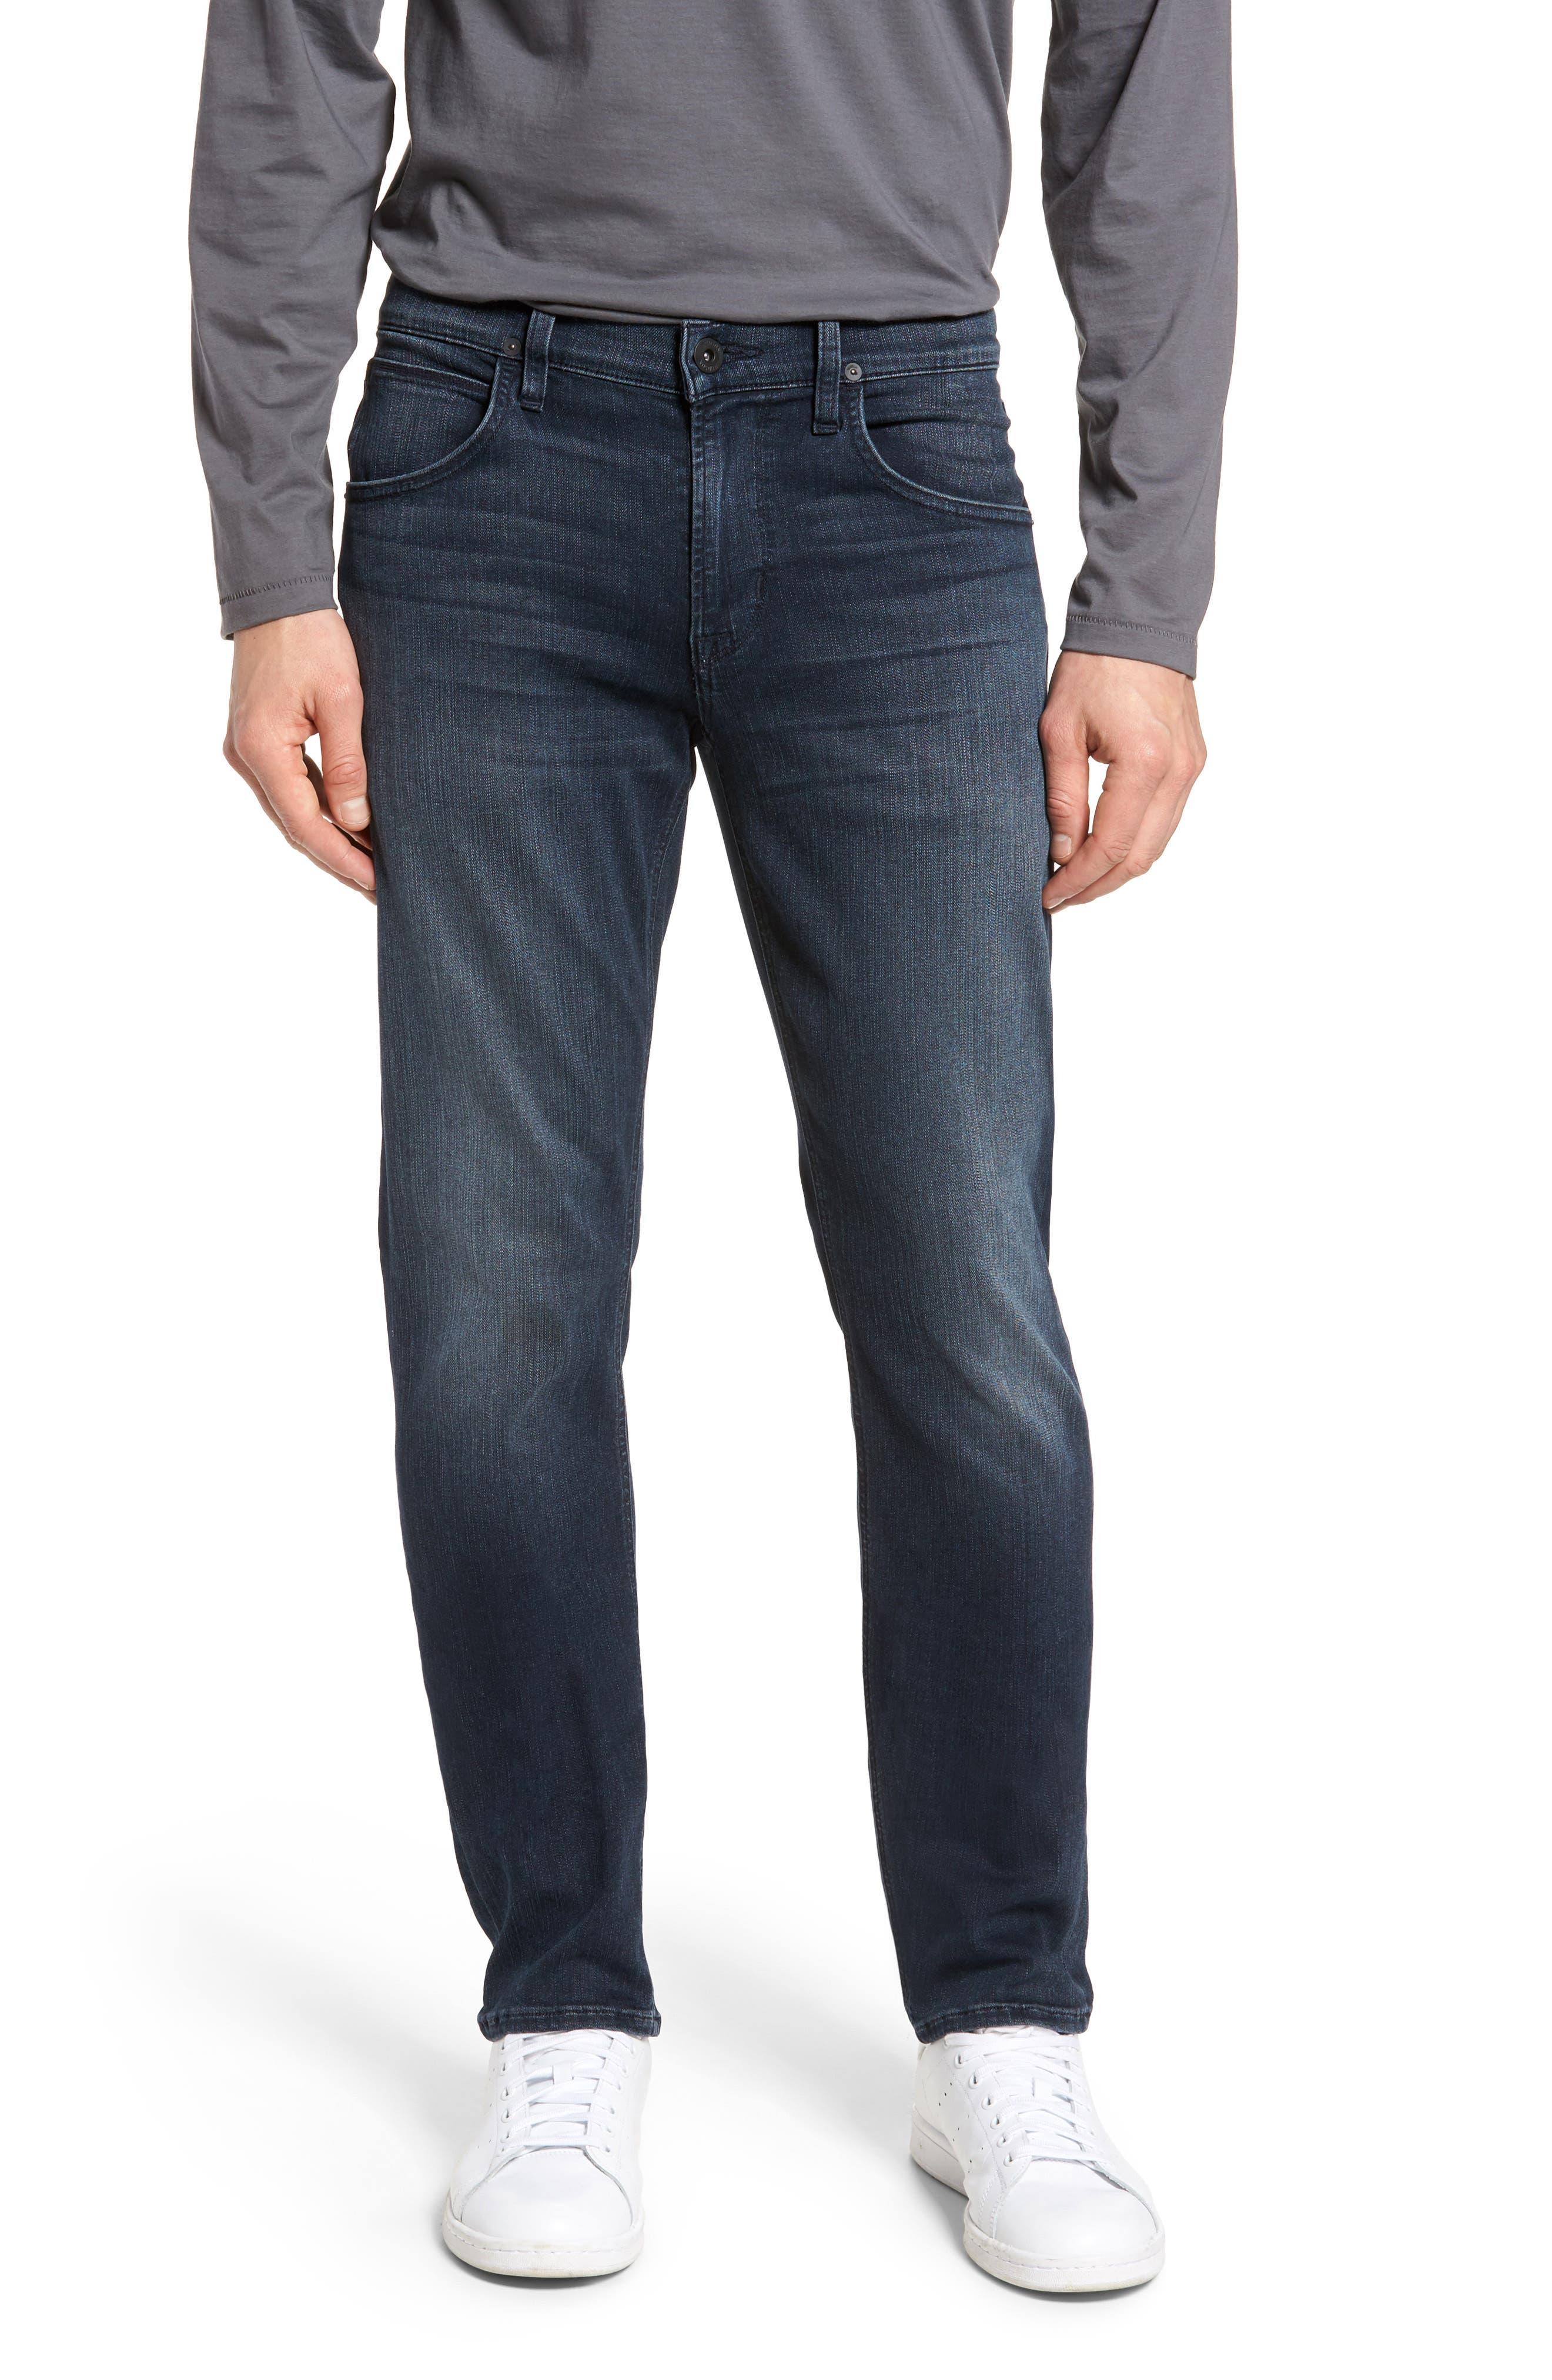 Blake Slim Fit Jeans,                             Main thumbnail 1, color,                             400